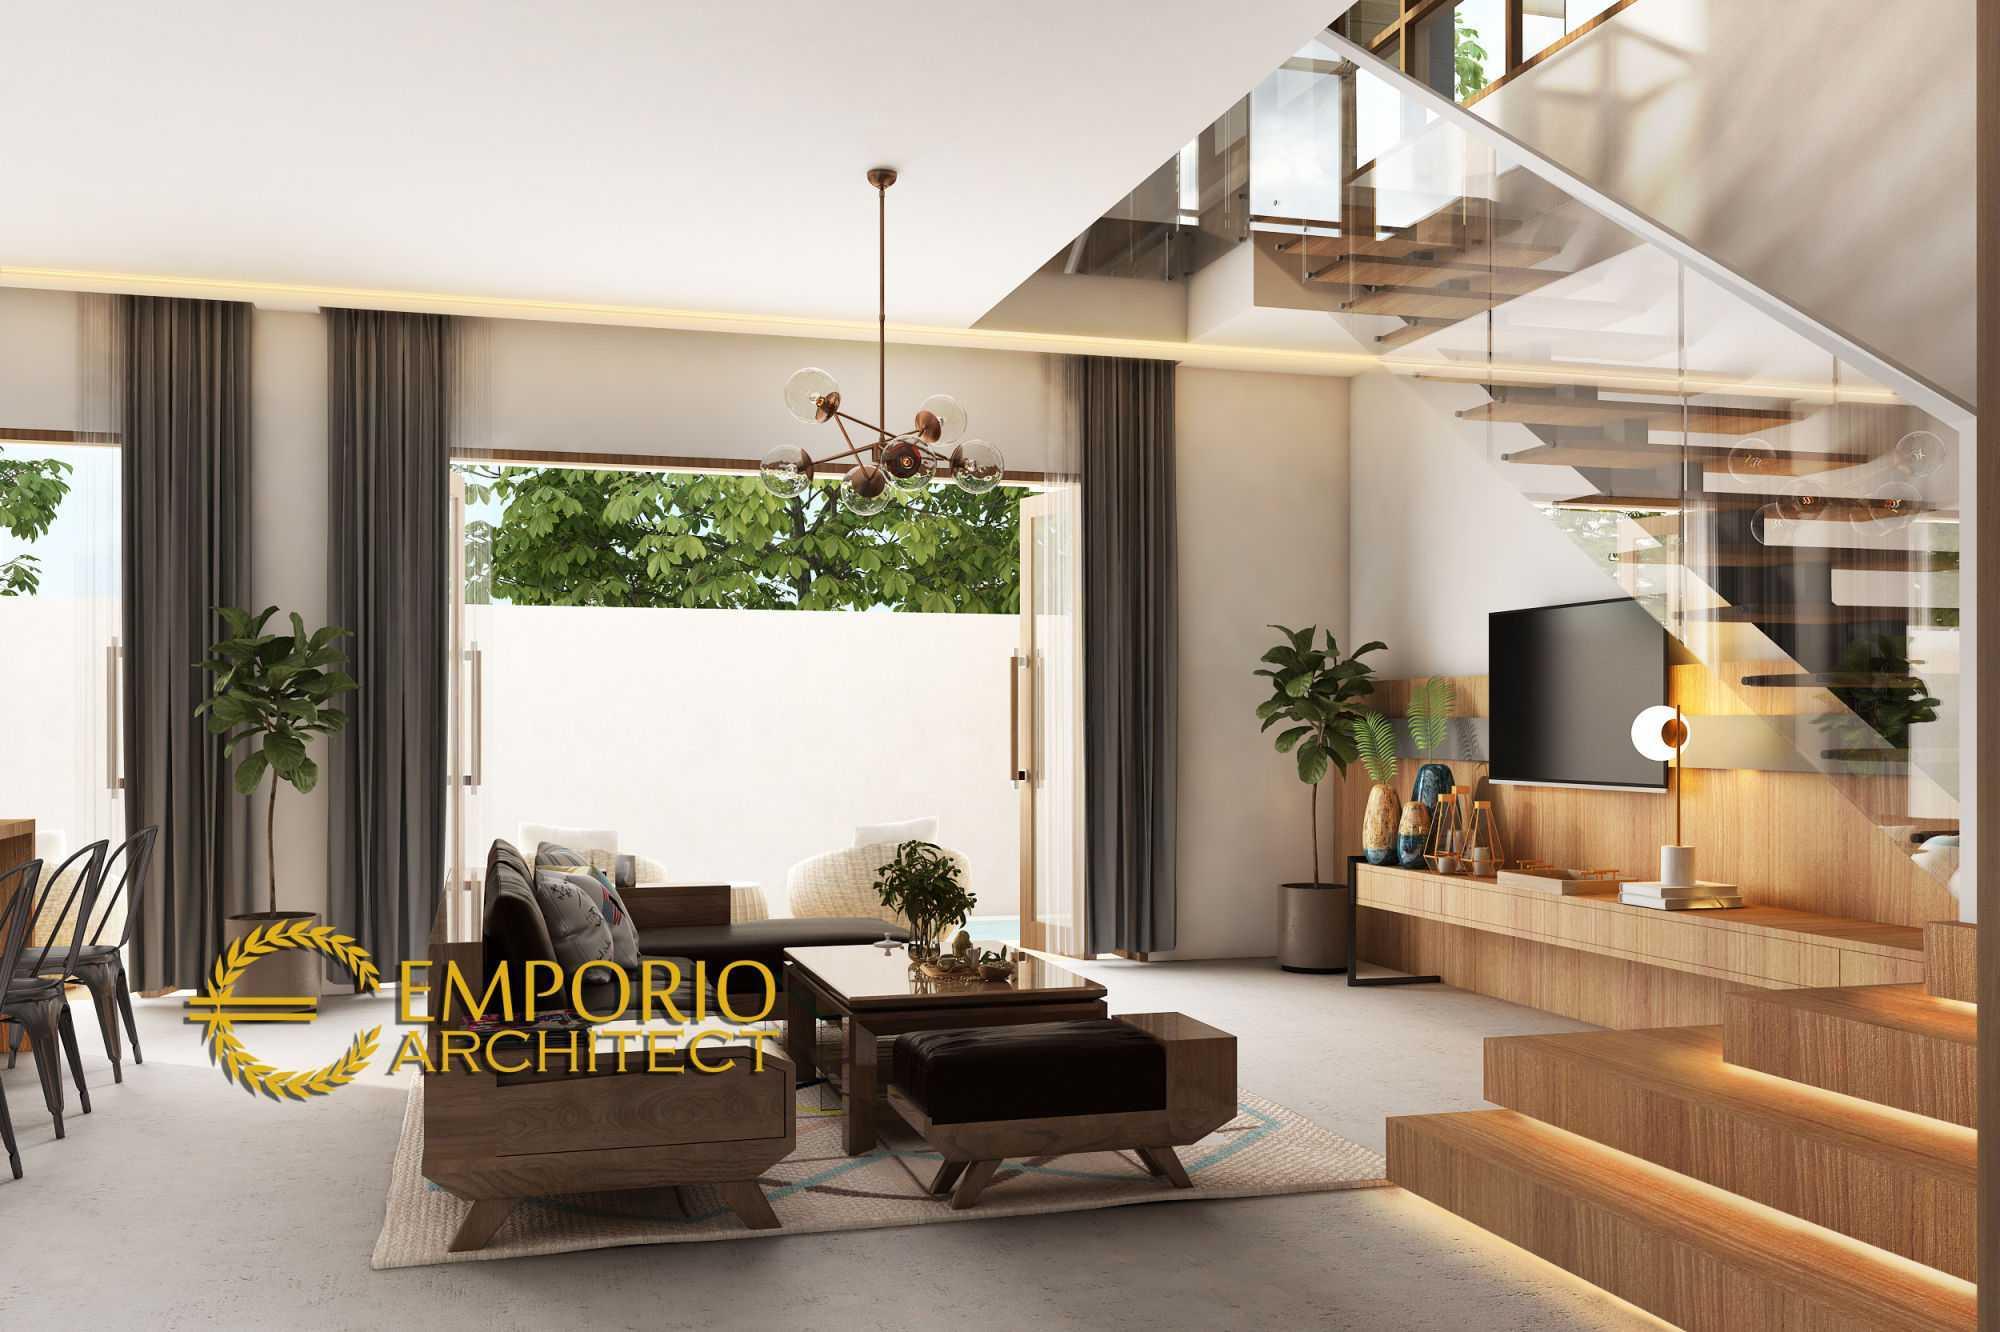 Emporio Architect Jasa Arsitek Jakarta Desain Rumah Modern Tropis 647 @ Jakarta Jakarta, Daerah Khusus Ibukota Jakarta, Indonesia Jakarta, Daerah Khusus Ibukota Jakarta, Indonesia Emporio-Architect-Jasa-Arsitek-Jakarta-Desain-Rumah-Modern-Tropis-647-Jakarta  79782